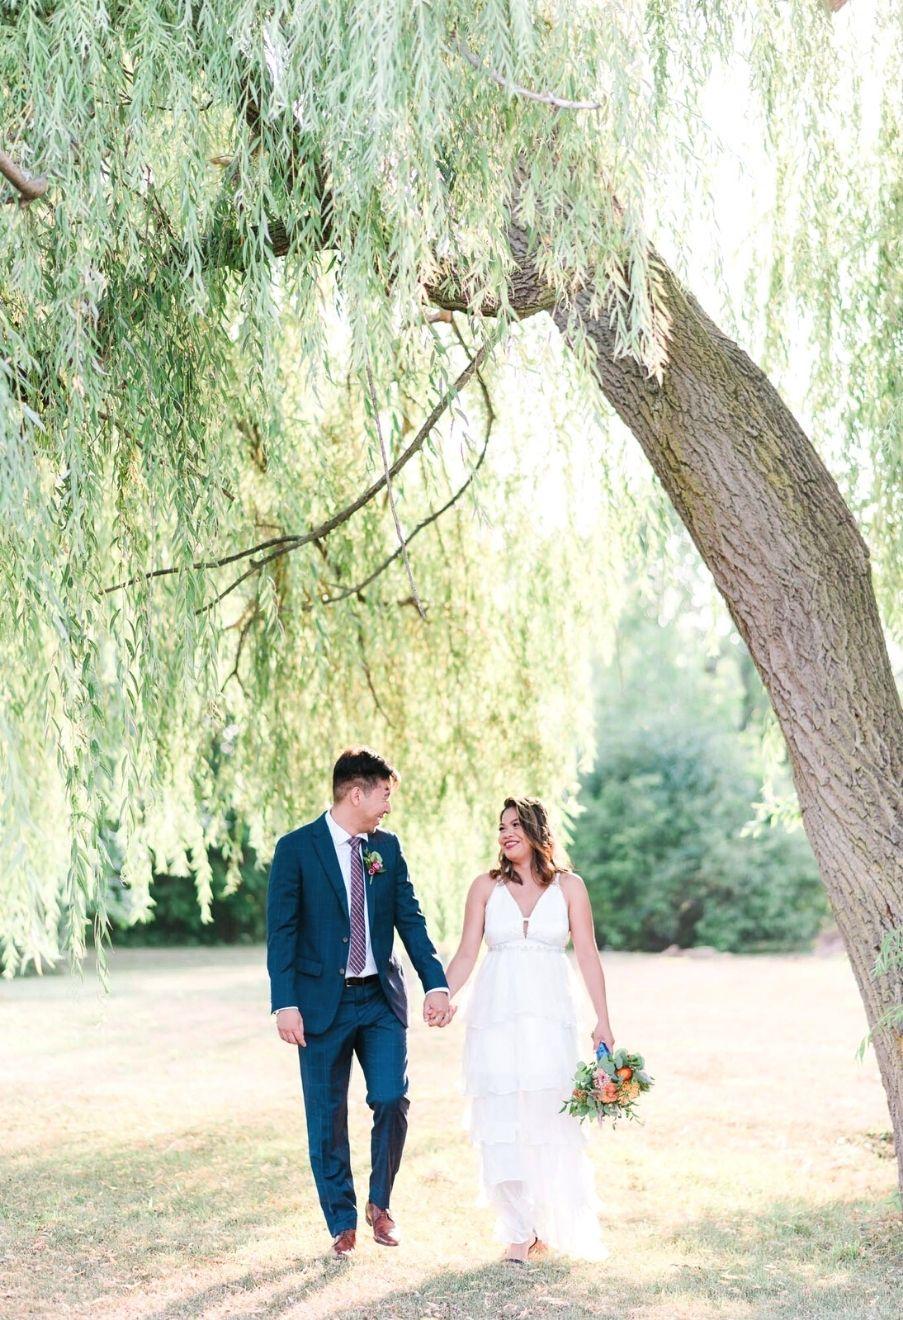 willow tree at gizio wedding